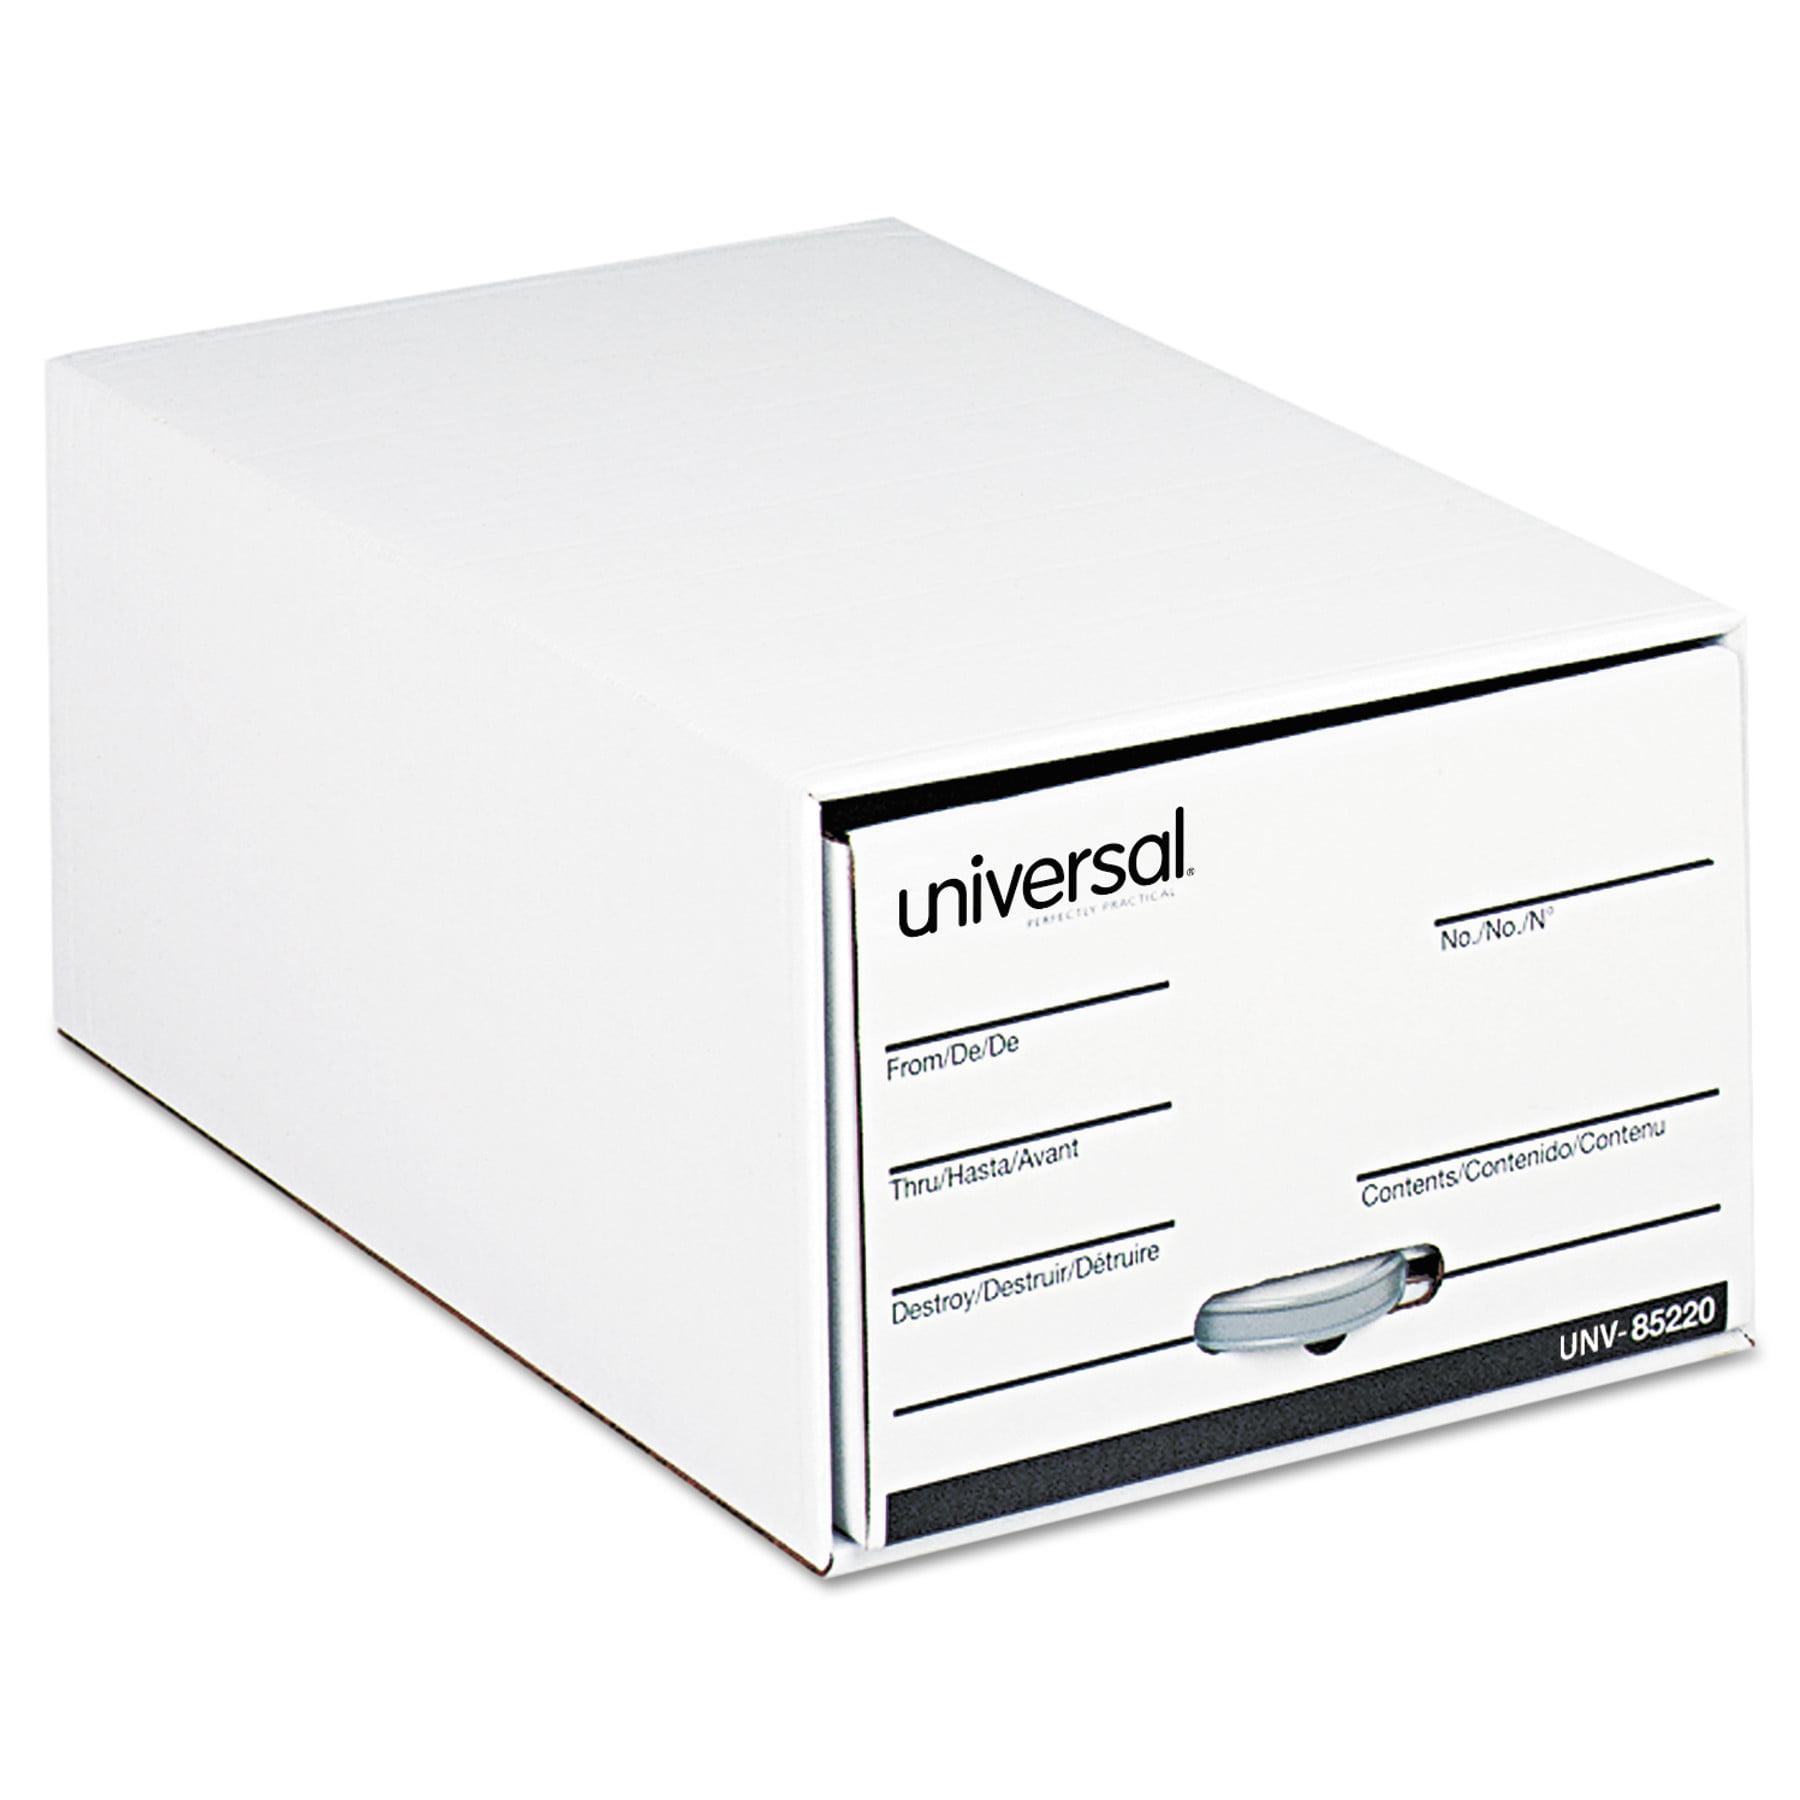 "Universal Storage Box Drawer Files, Legal, Fiberboard, 15"" x 24"" x 10"", White, 6/Carton"